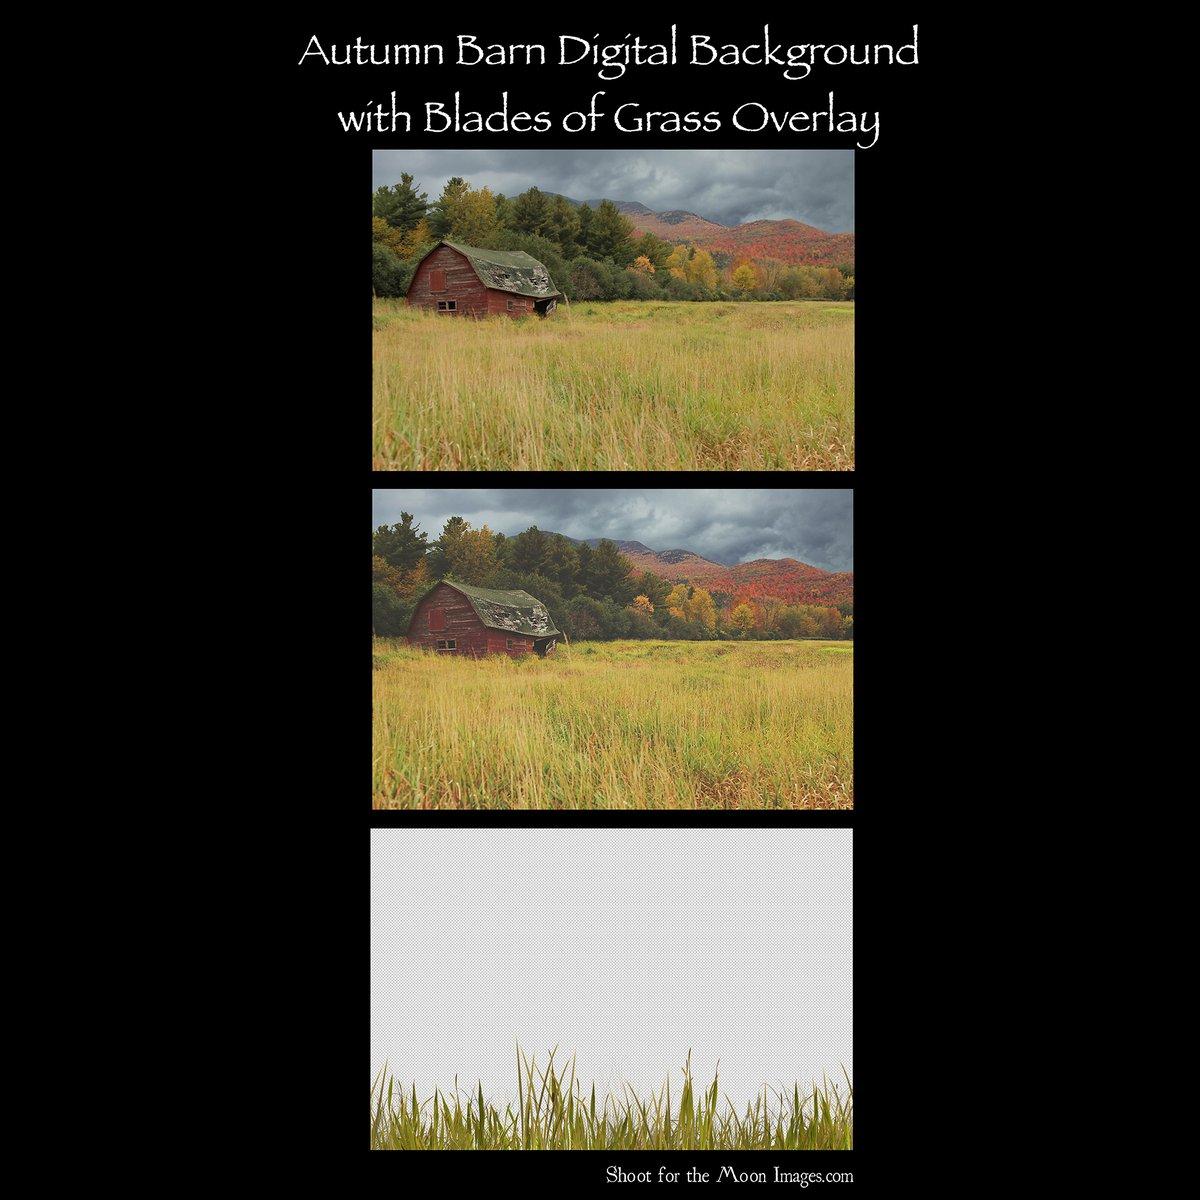 Image of Autumn Barn Digital Backgrounds